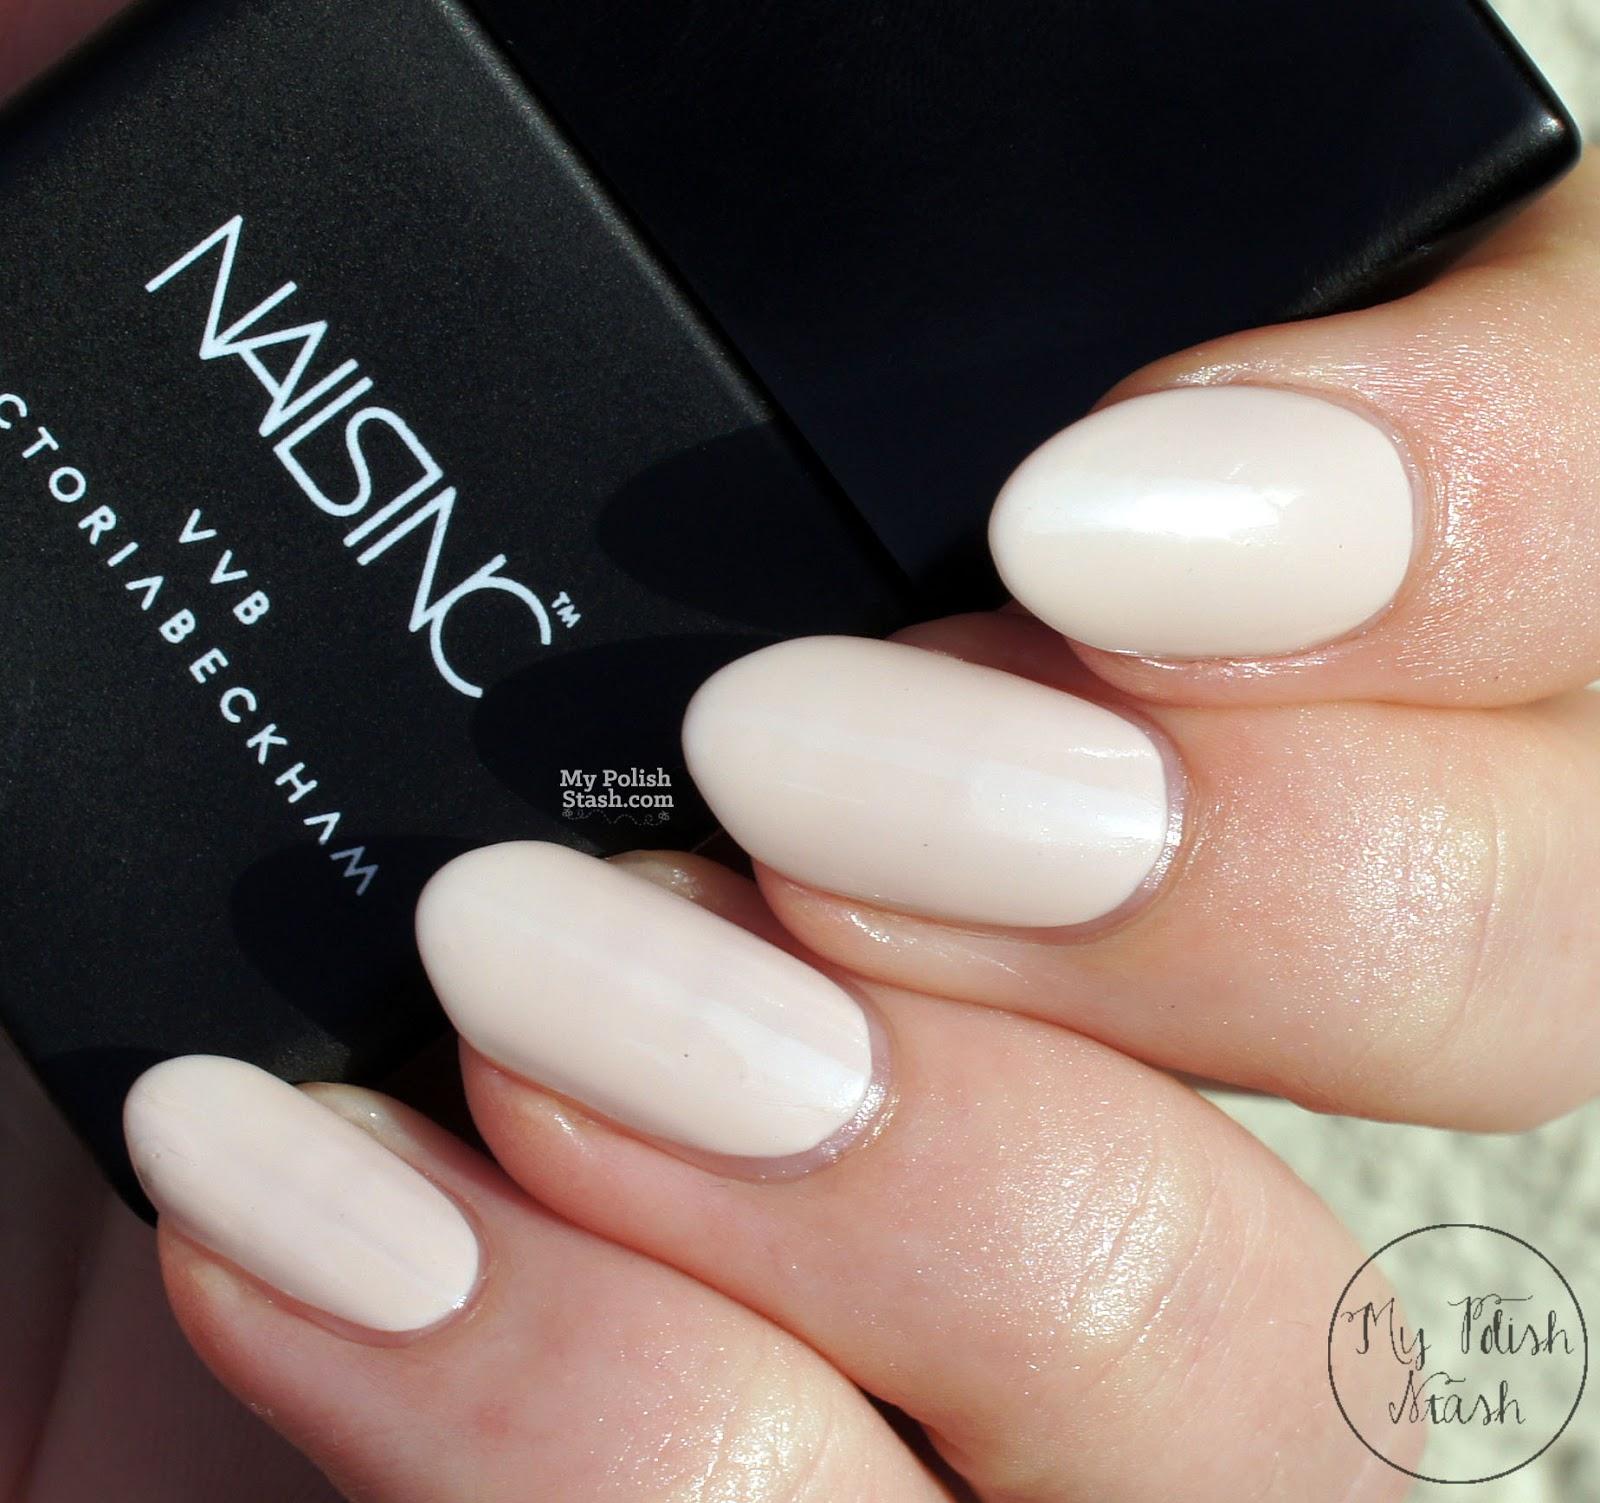 My Polish Stash: Job Interview Nails: Nails Inc x VVB - Bamboo White